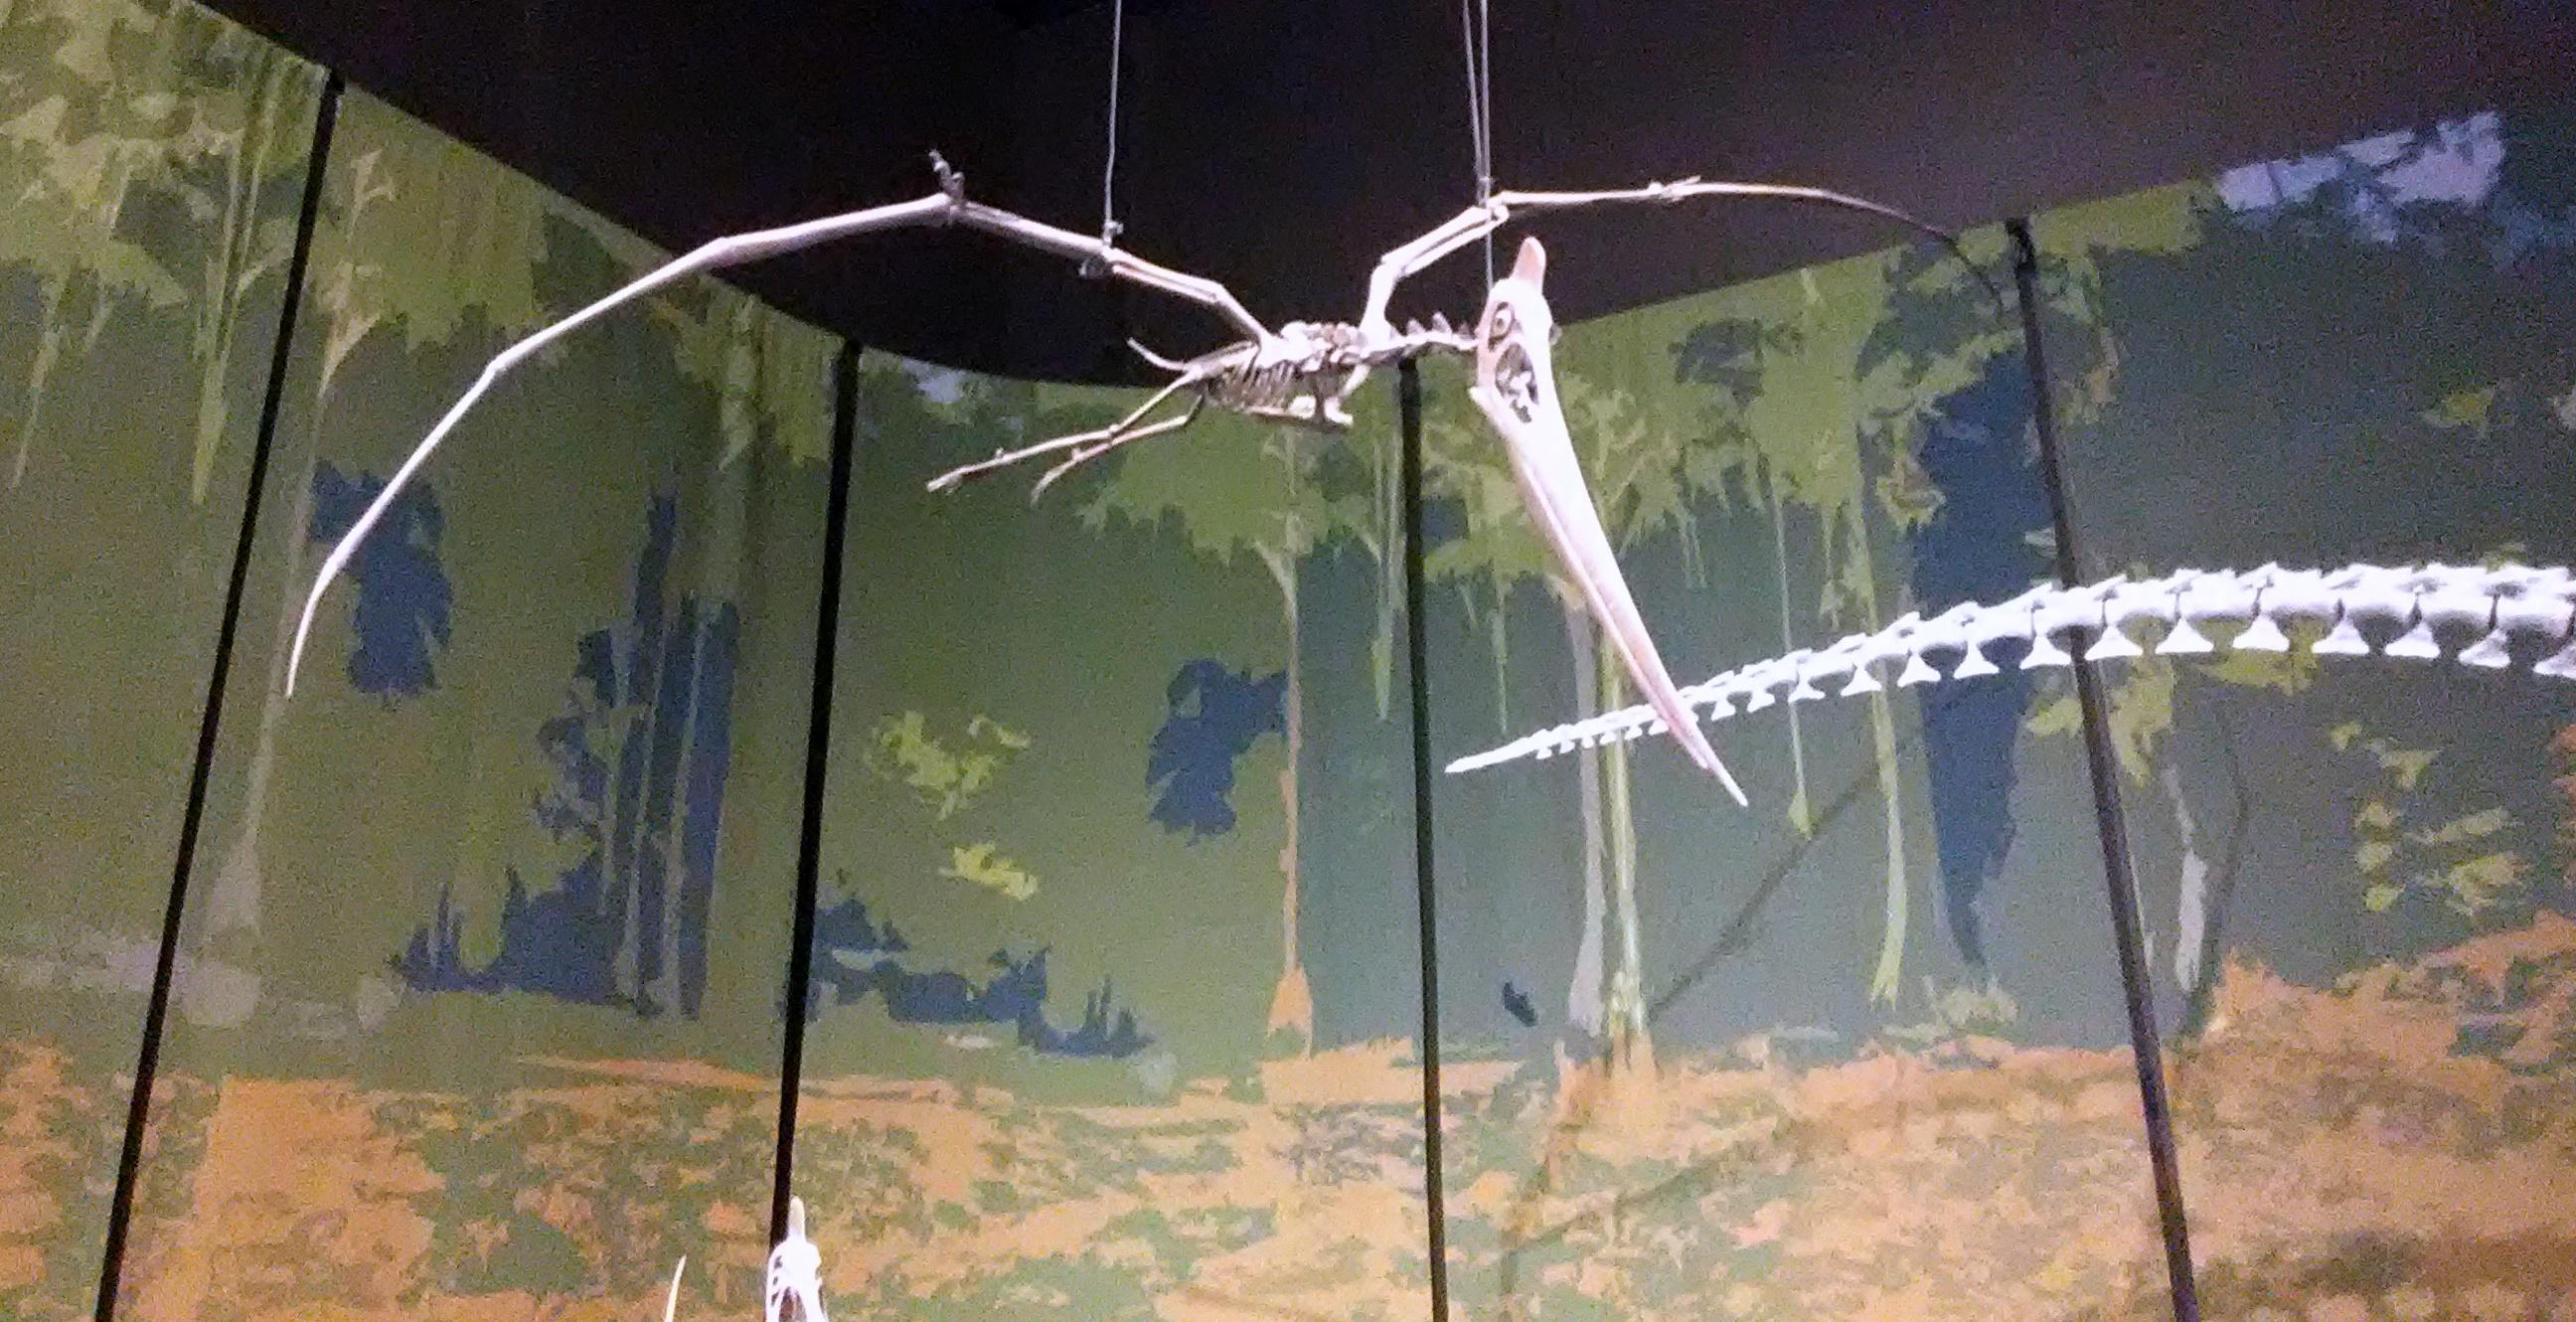 pterosaur tellus science museum jul 2019.jpg